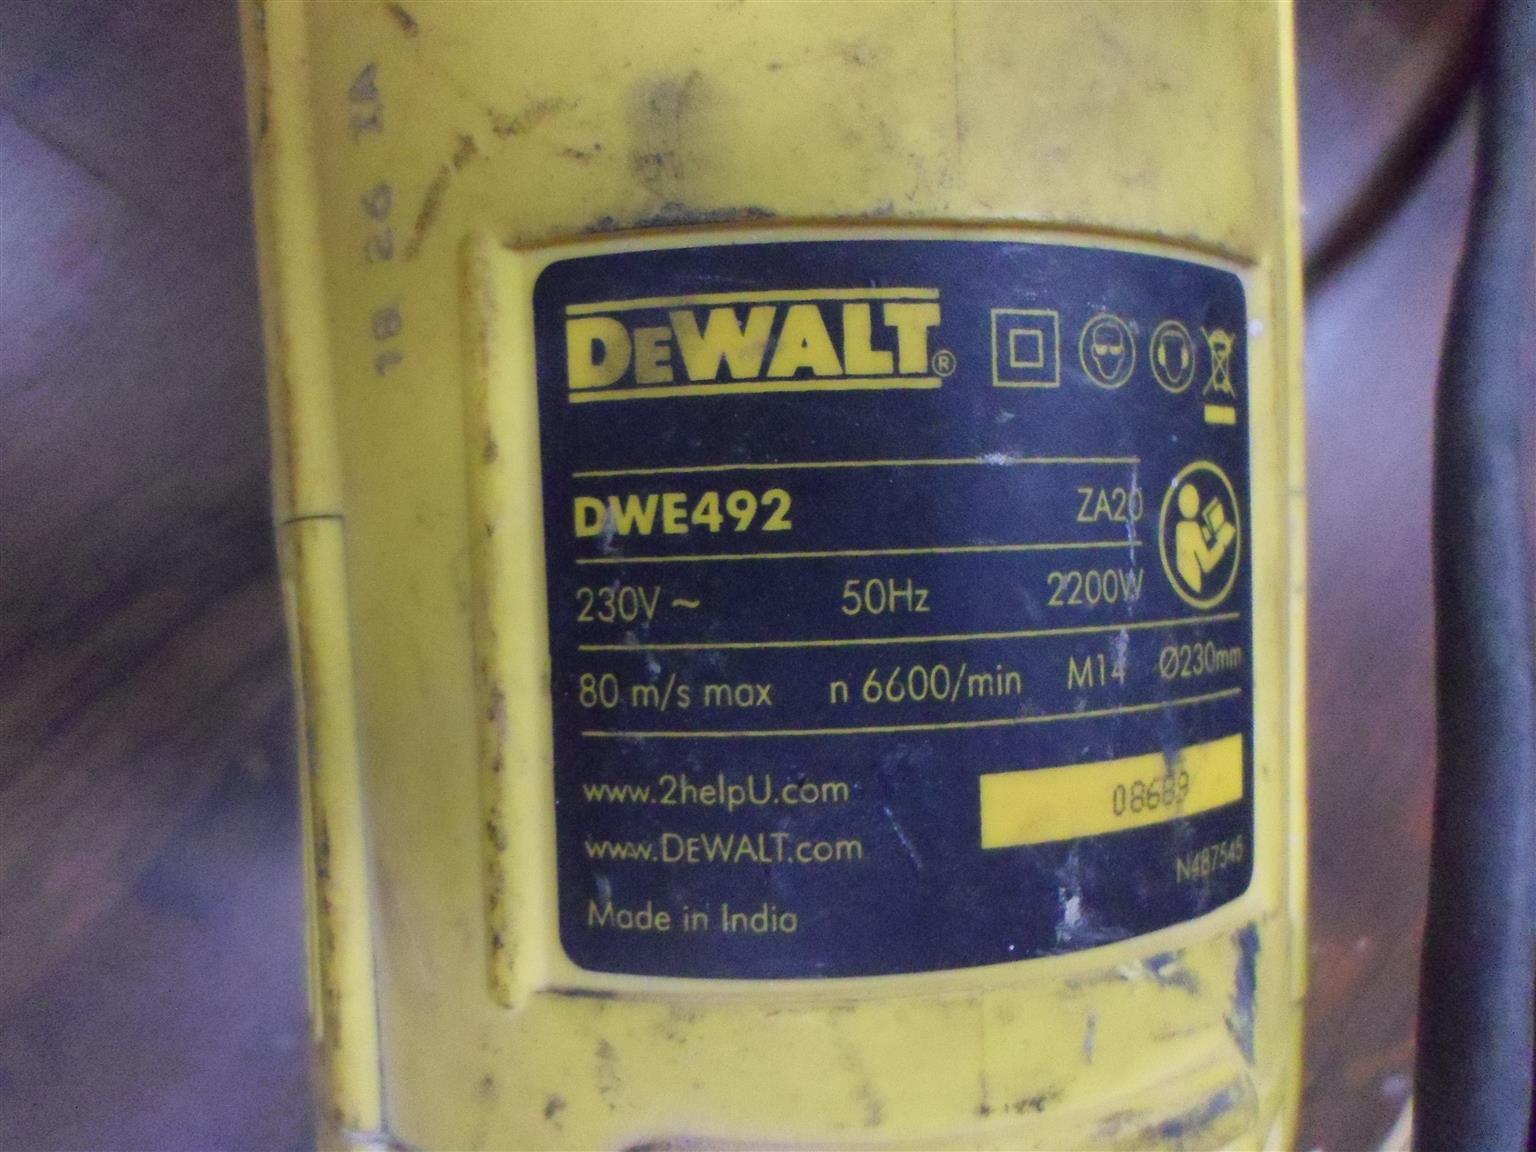 2200W DeWalt DWE492 Angle Grinder